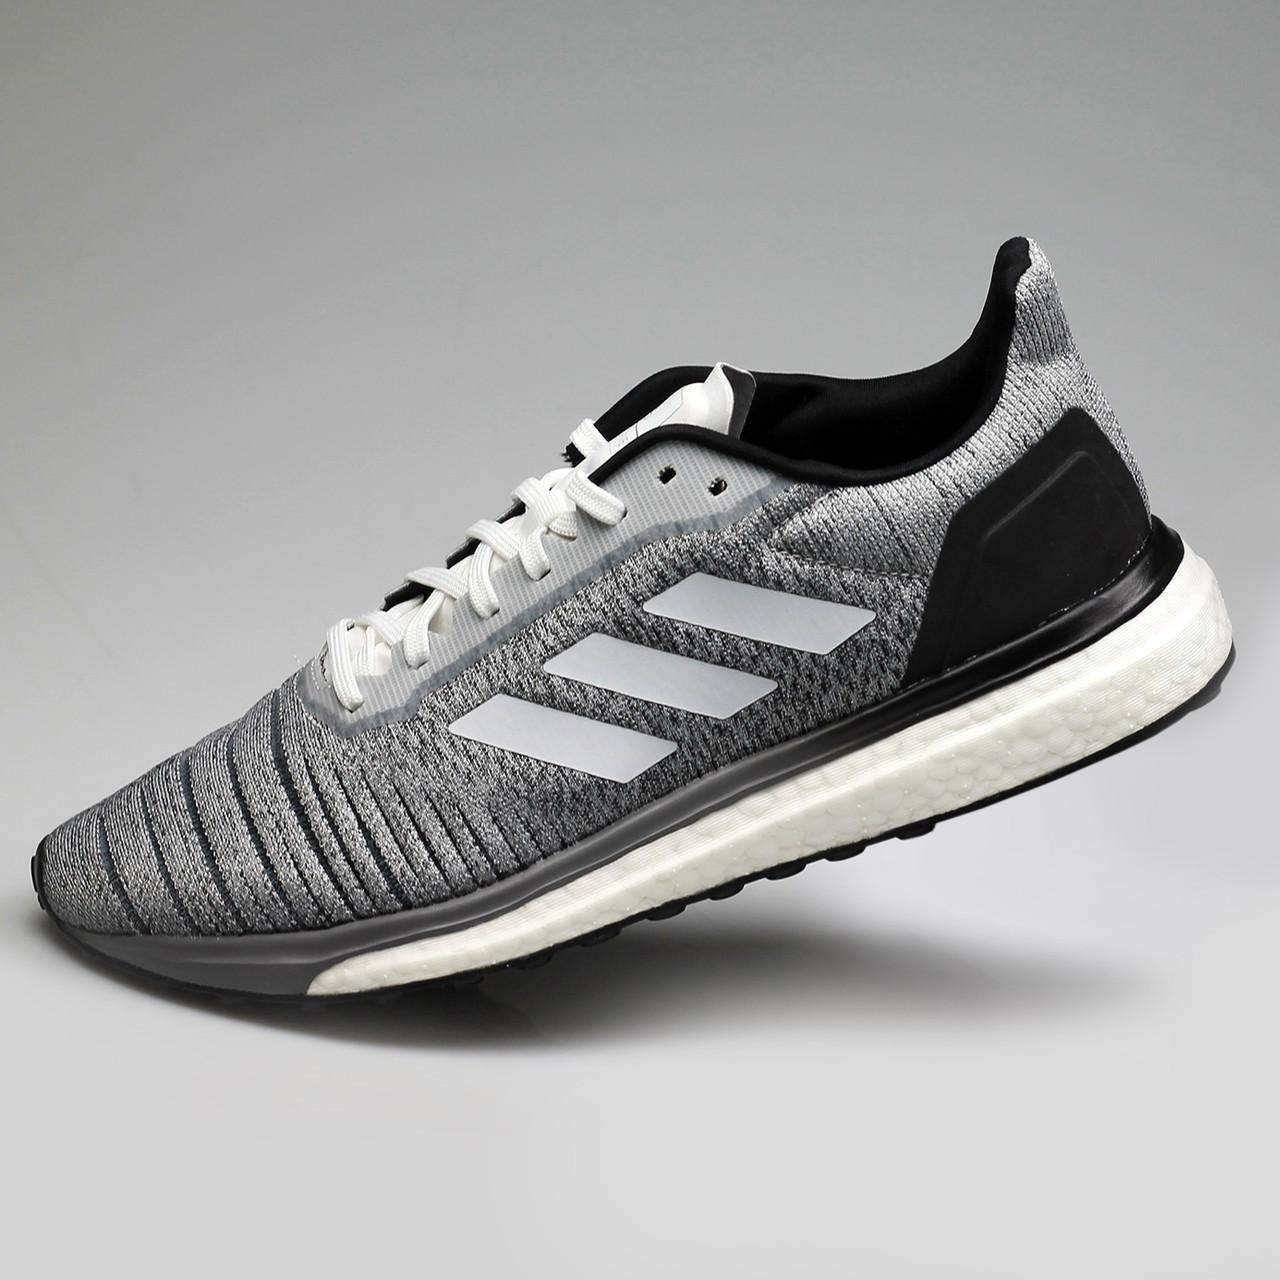 Adidas Solar Drive Men's Running Sneakers AQ0337